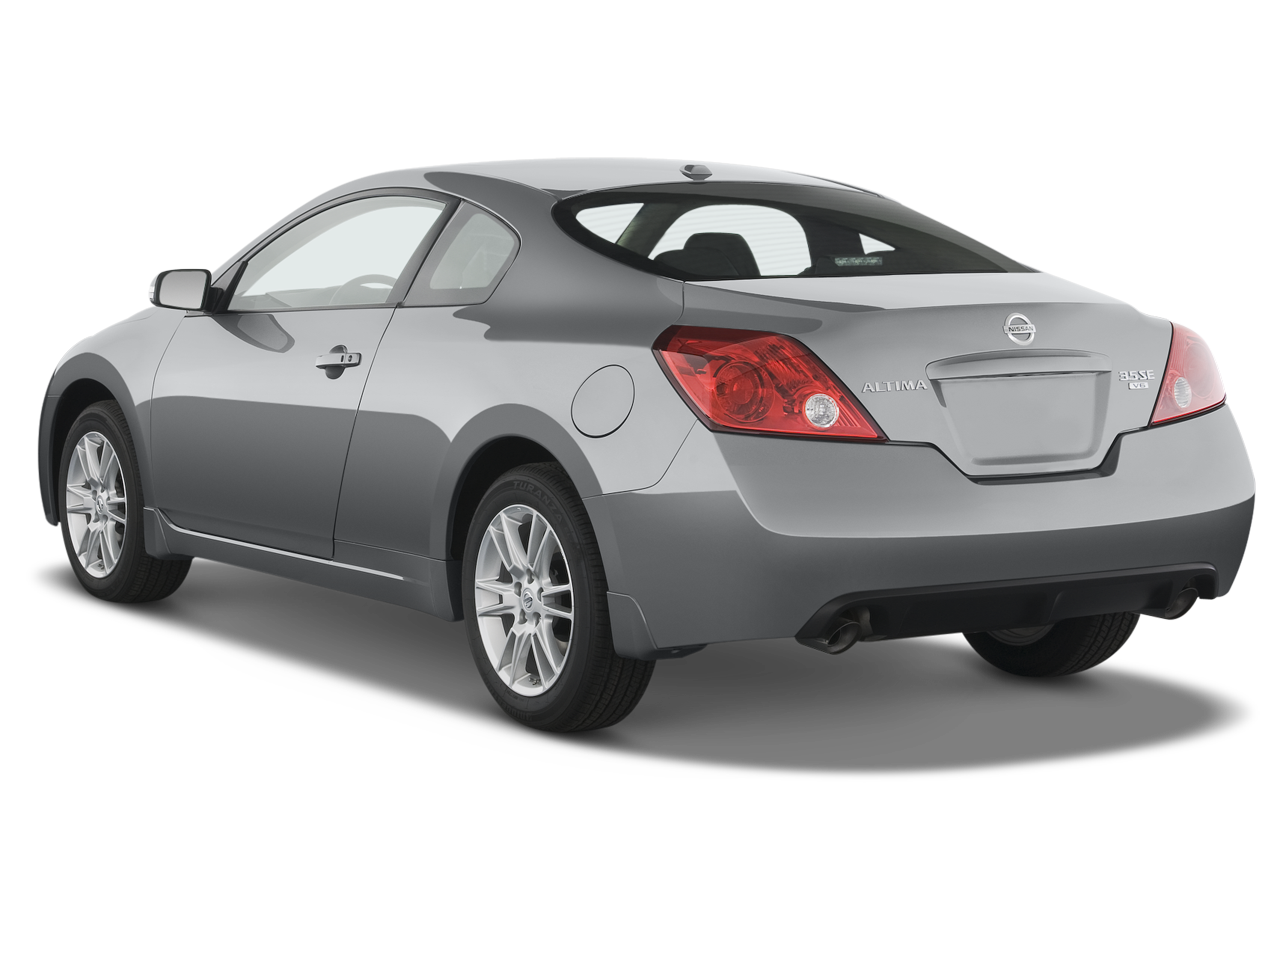 2008 Nissan Altima Hybrid Fuel Efficient News Car